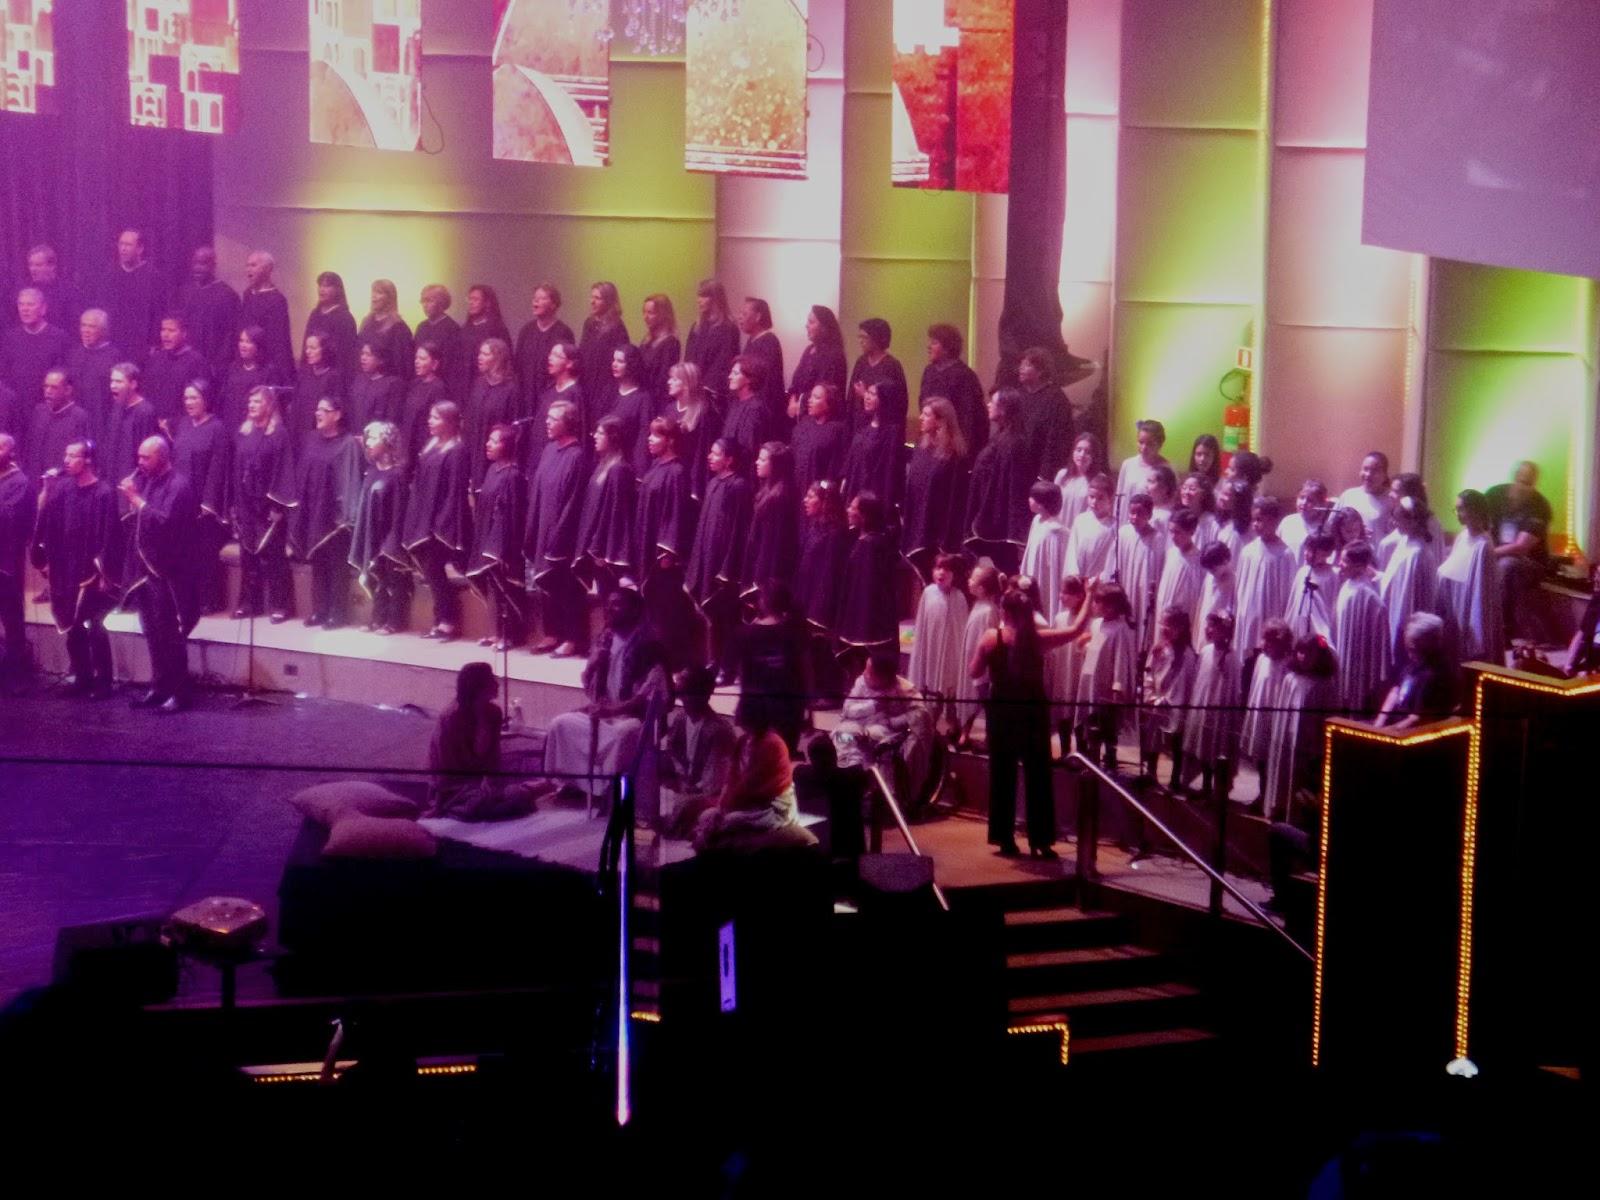 Nataleluia na 1ª Igreja Batista de Curitiba - Curitiba